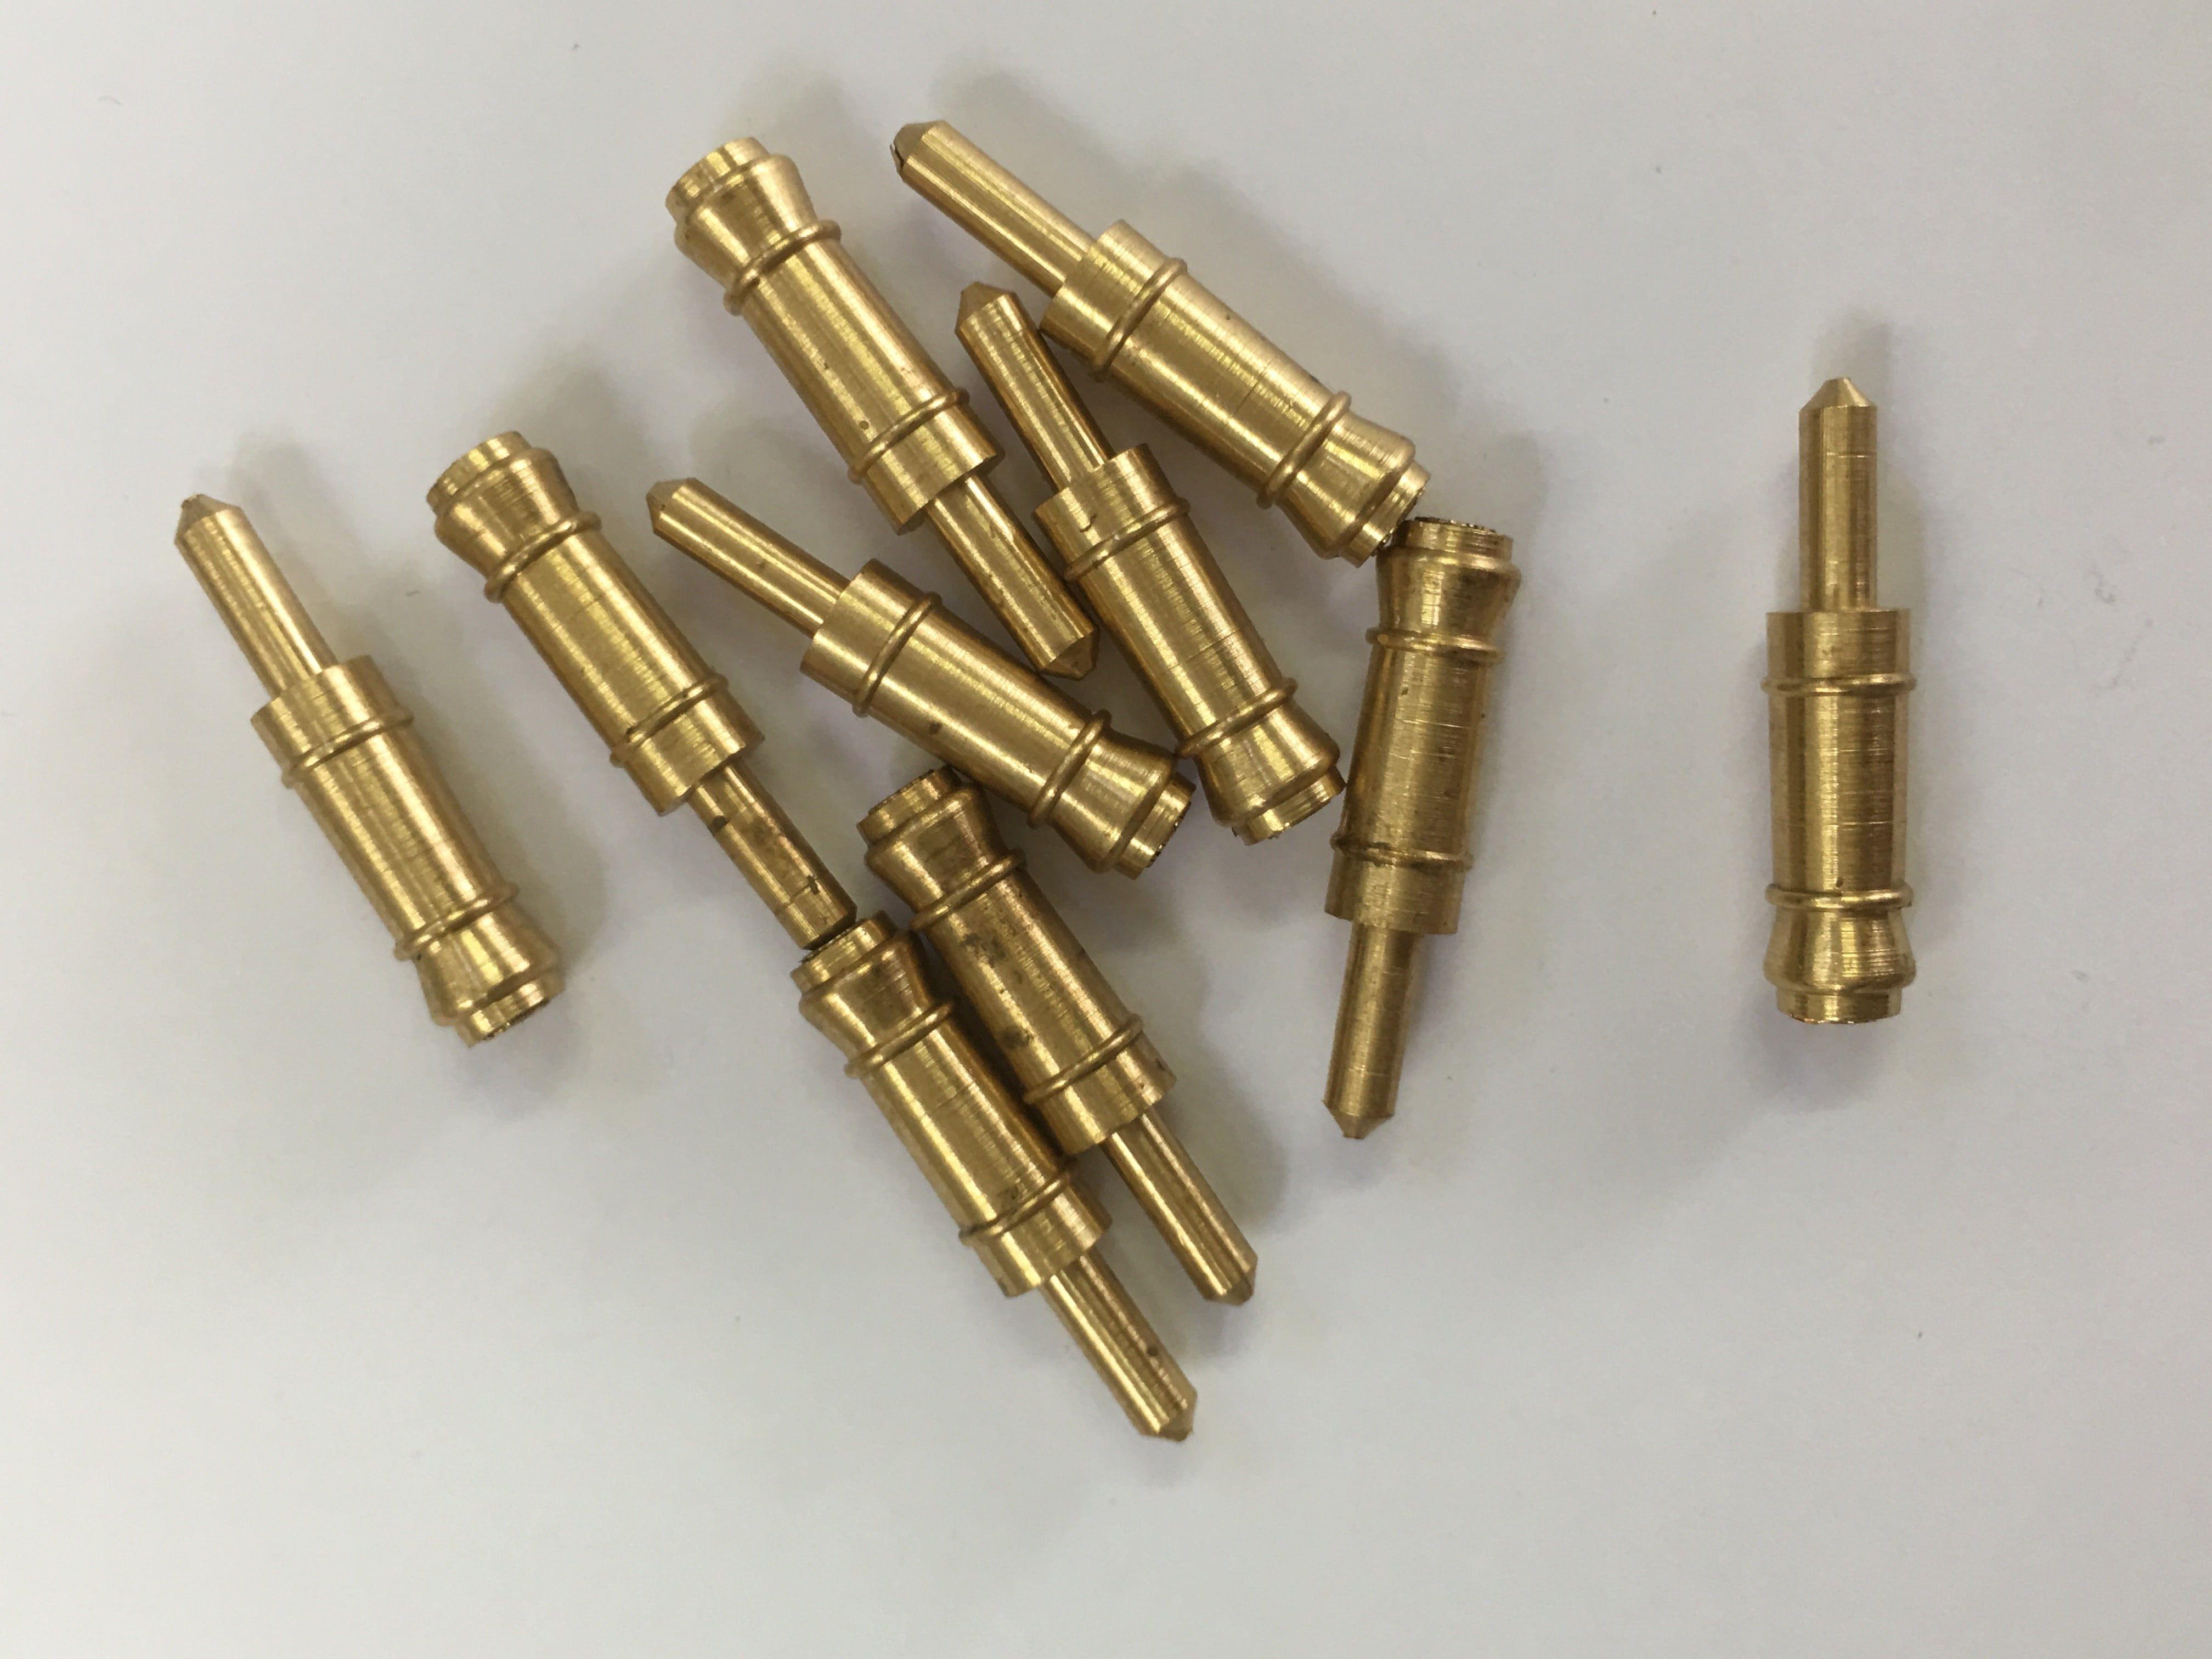 Mantua Models Solid Brass Dummy Barrels - 17mm Brass Dummy Barrel